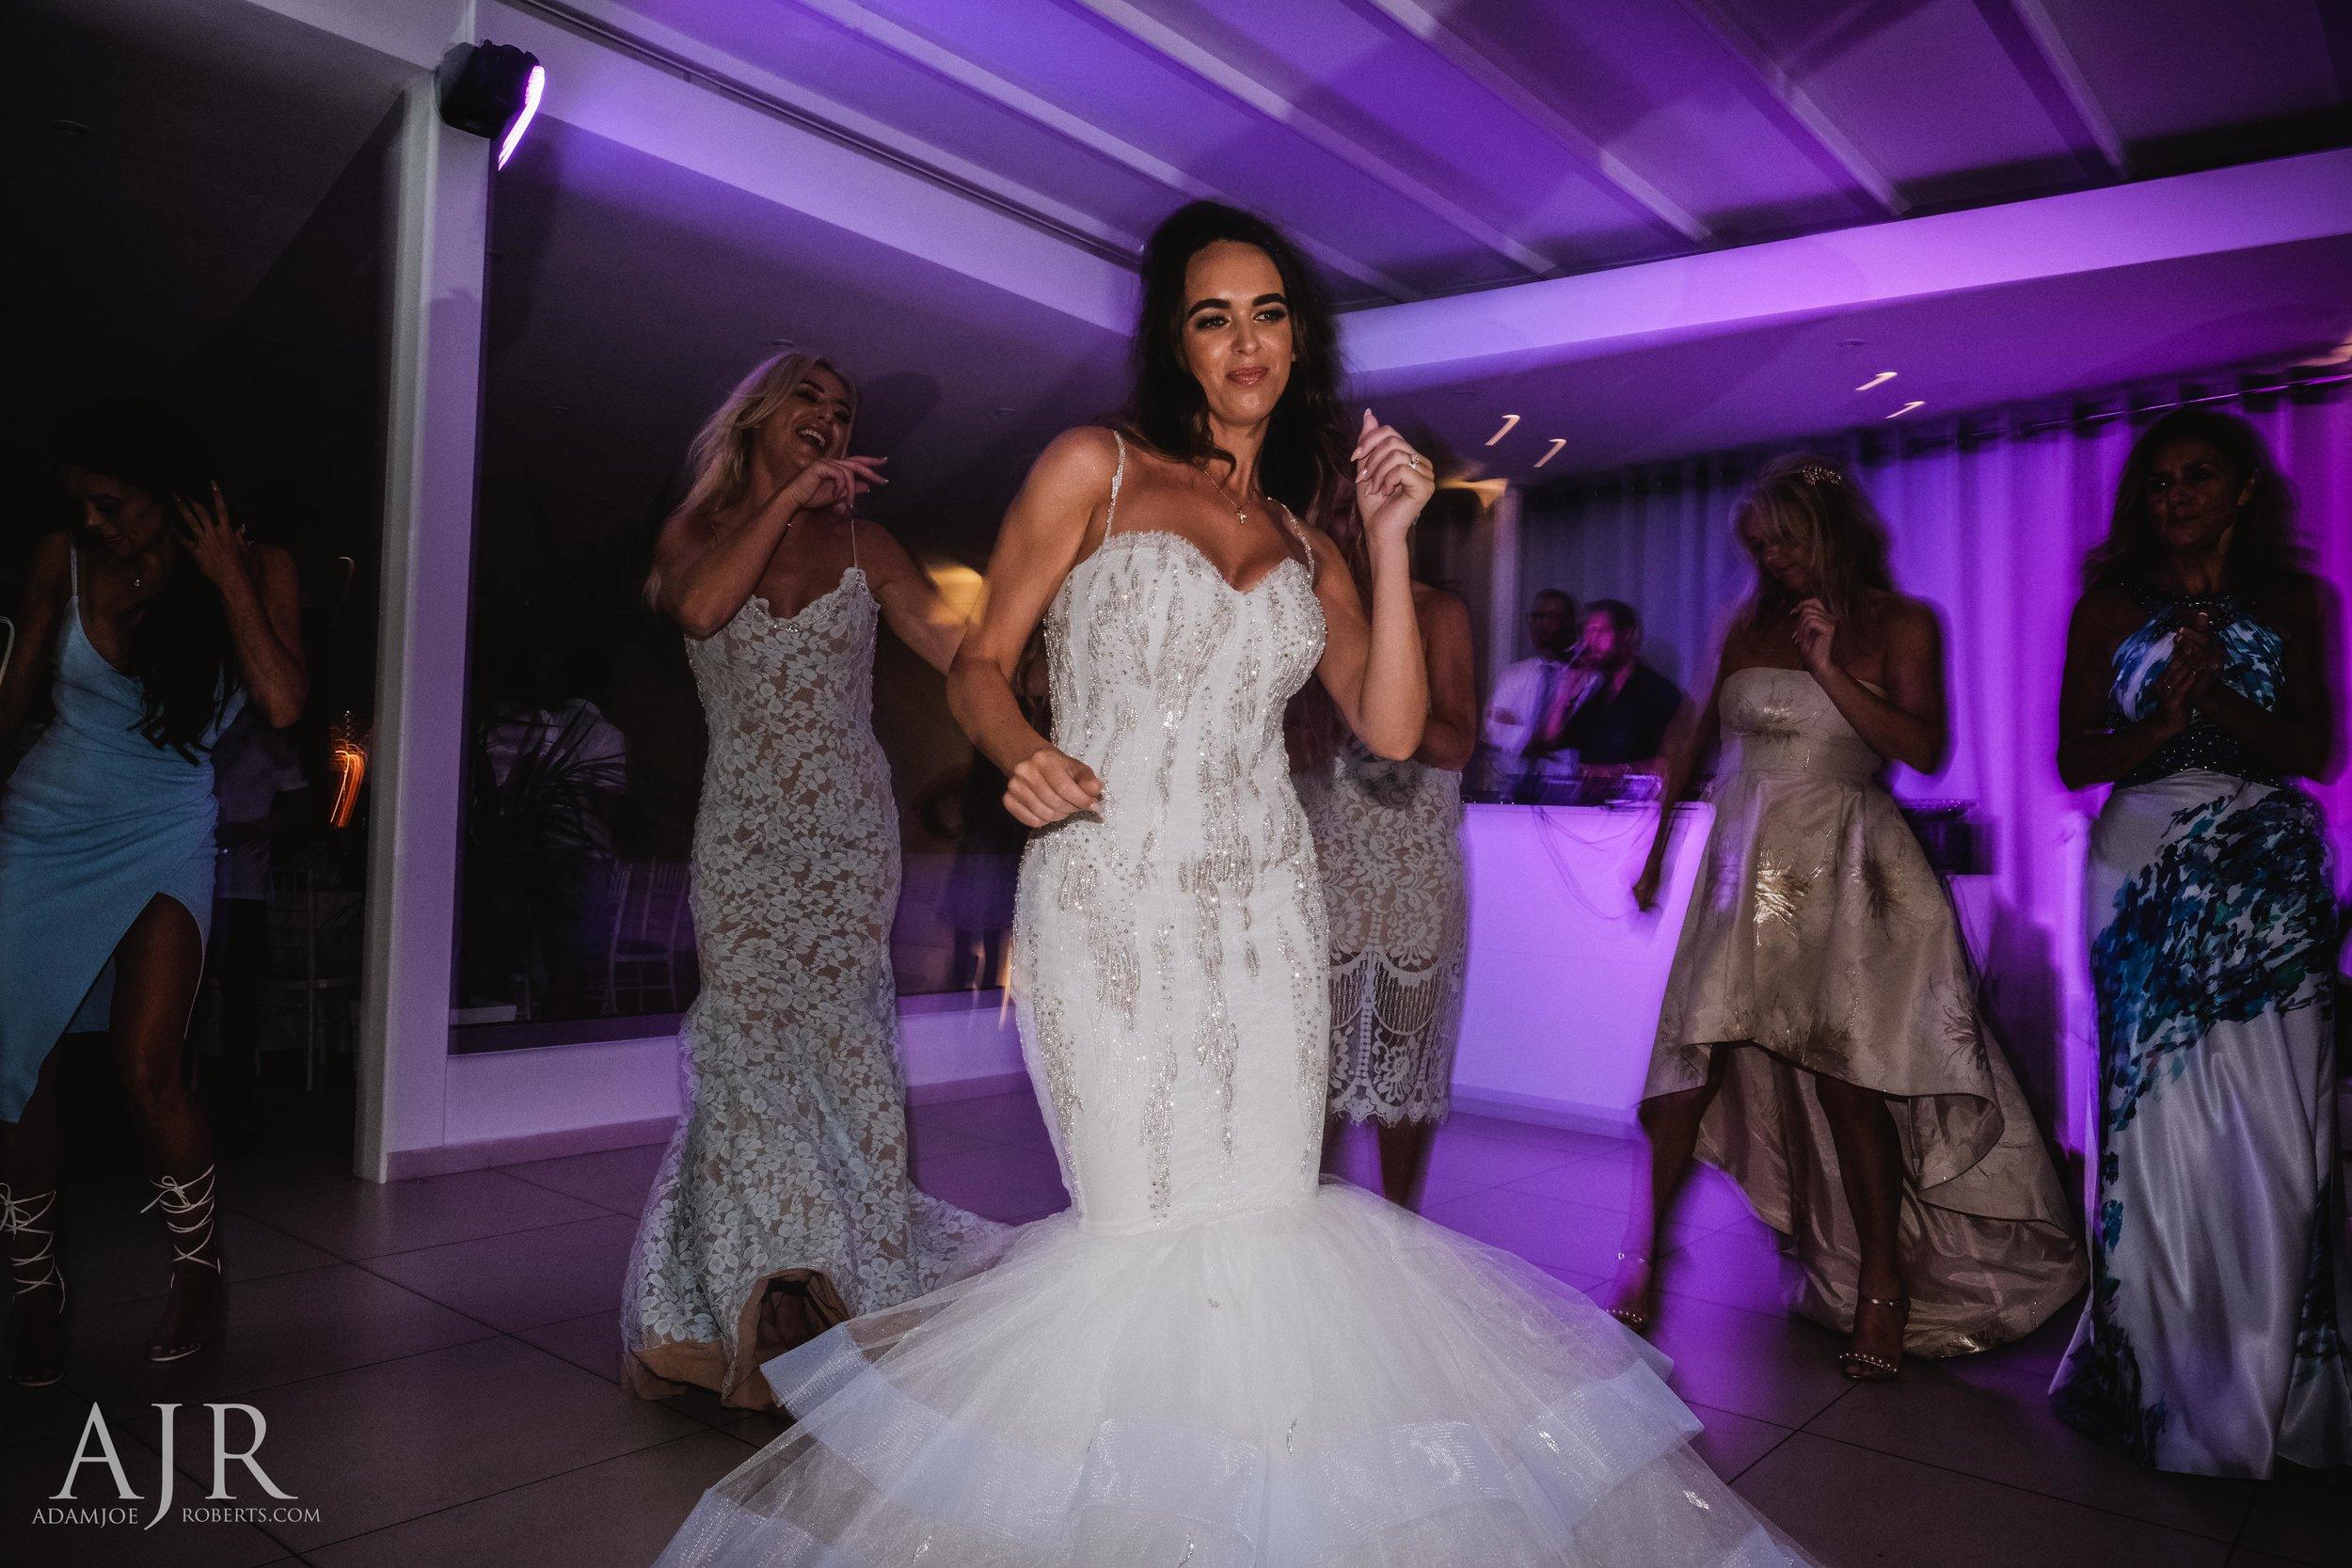 Mollie and Antony Le Ciel Santorini Destination Wedding - Sneak Peek (15 of 15).jpg